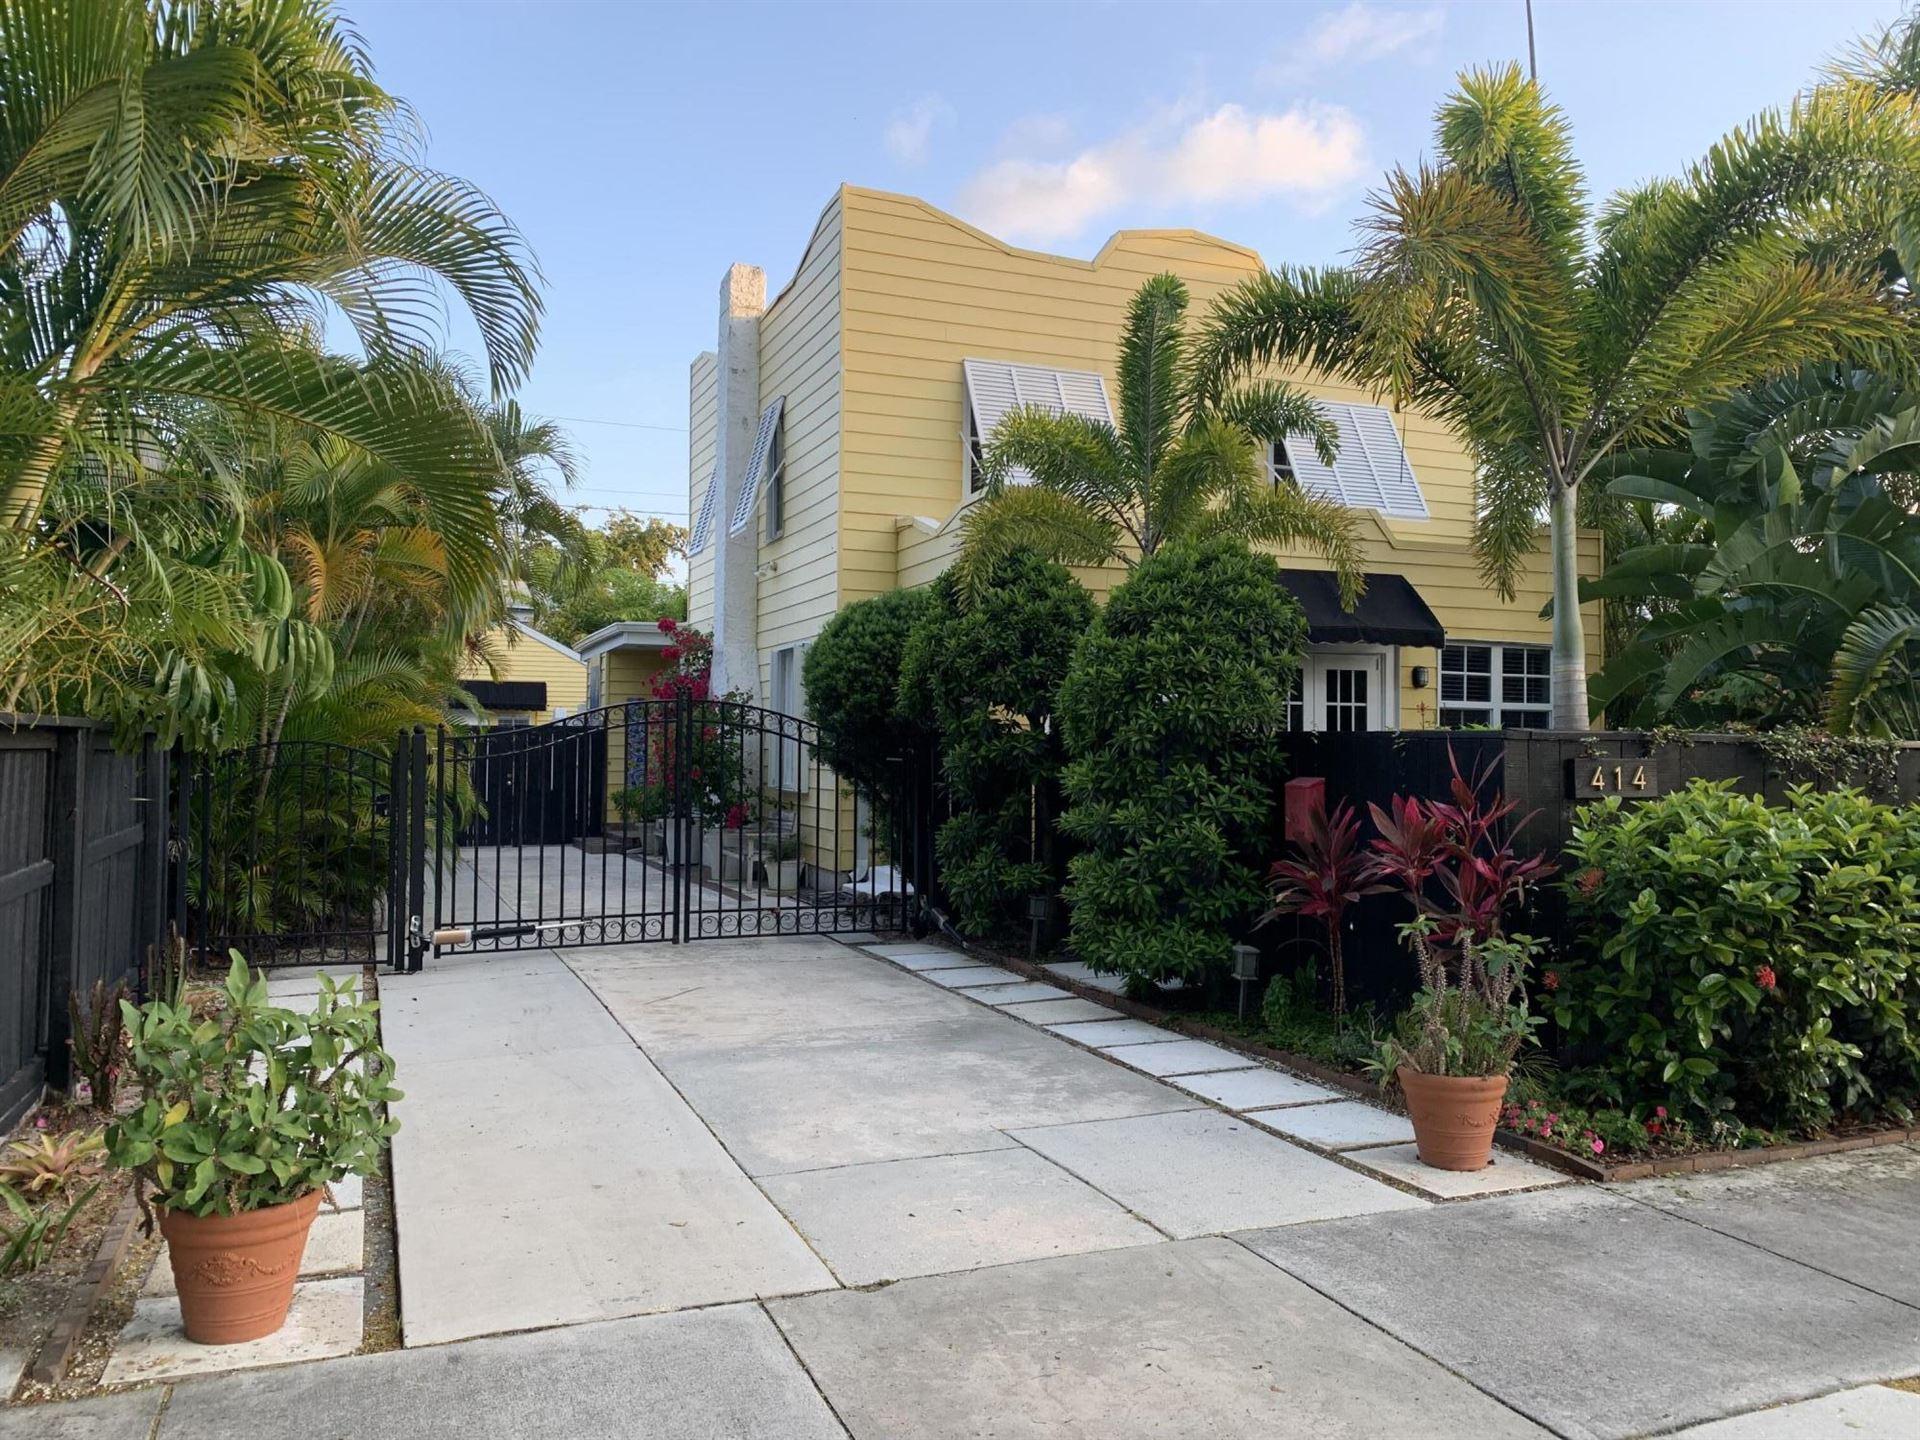 414 32nd Street, West Palm Beach, FL 33407 - MLS#: RX-10727155